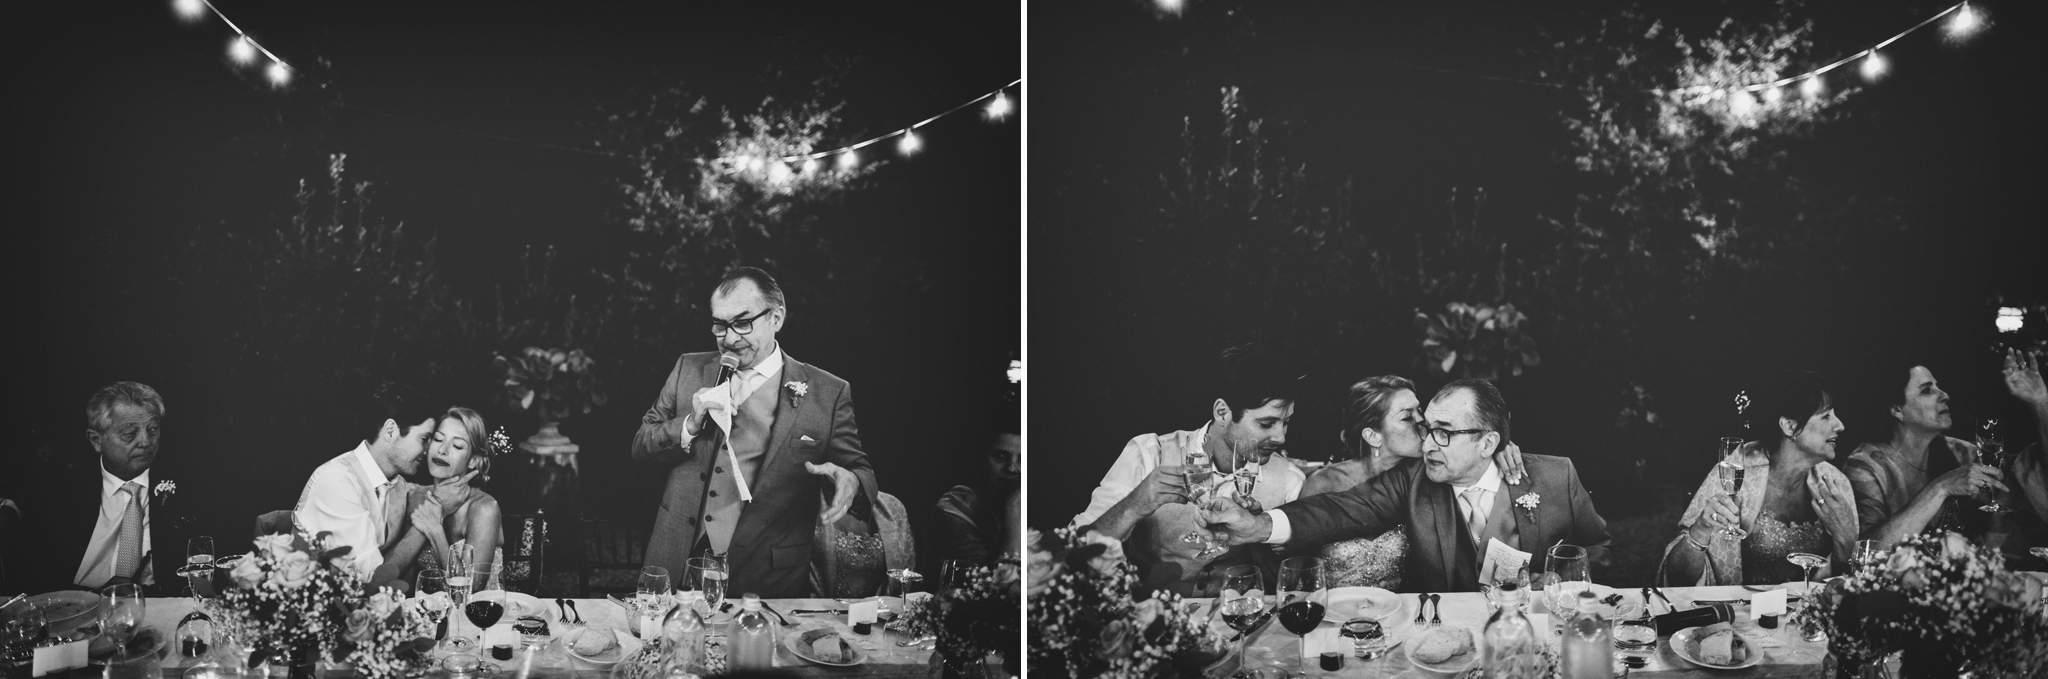 37fotografo-matrimonio-toscana-villa-teresa